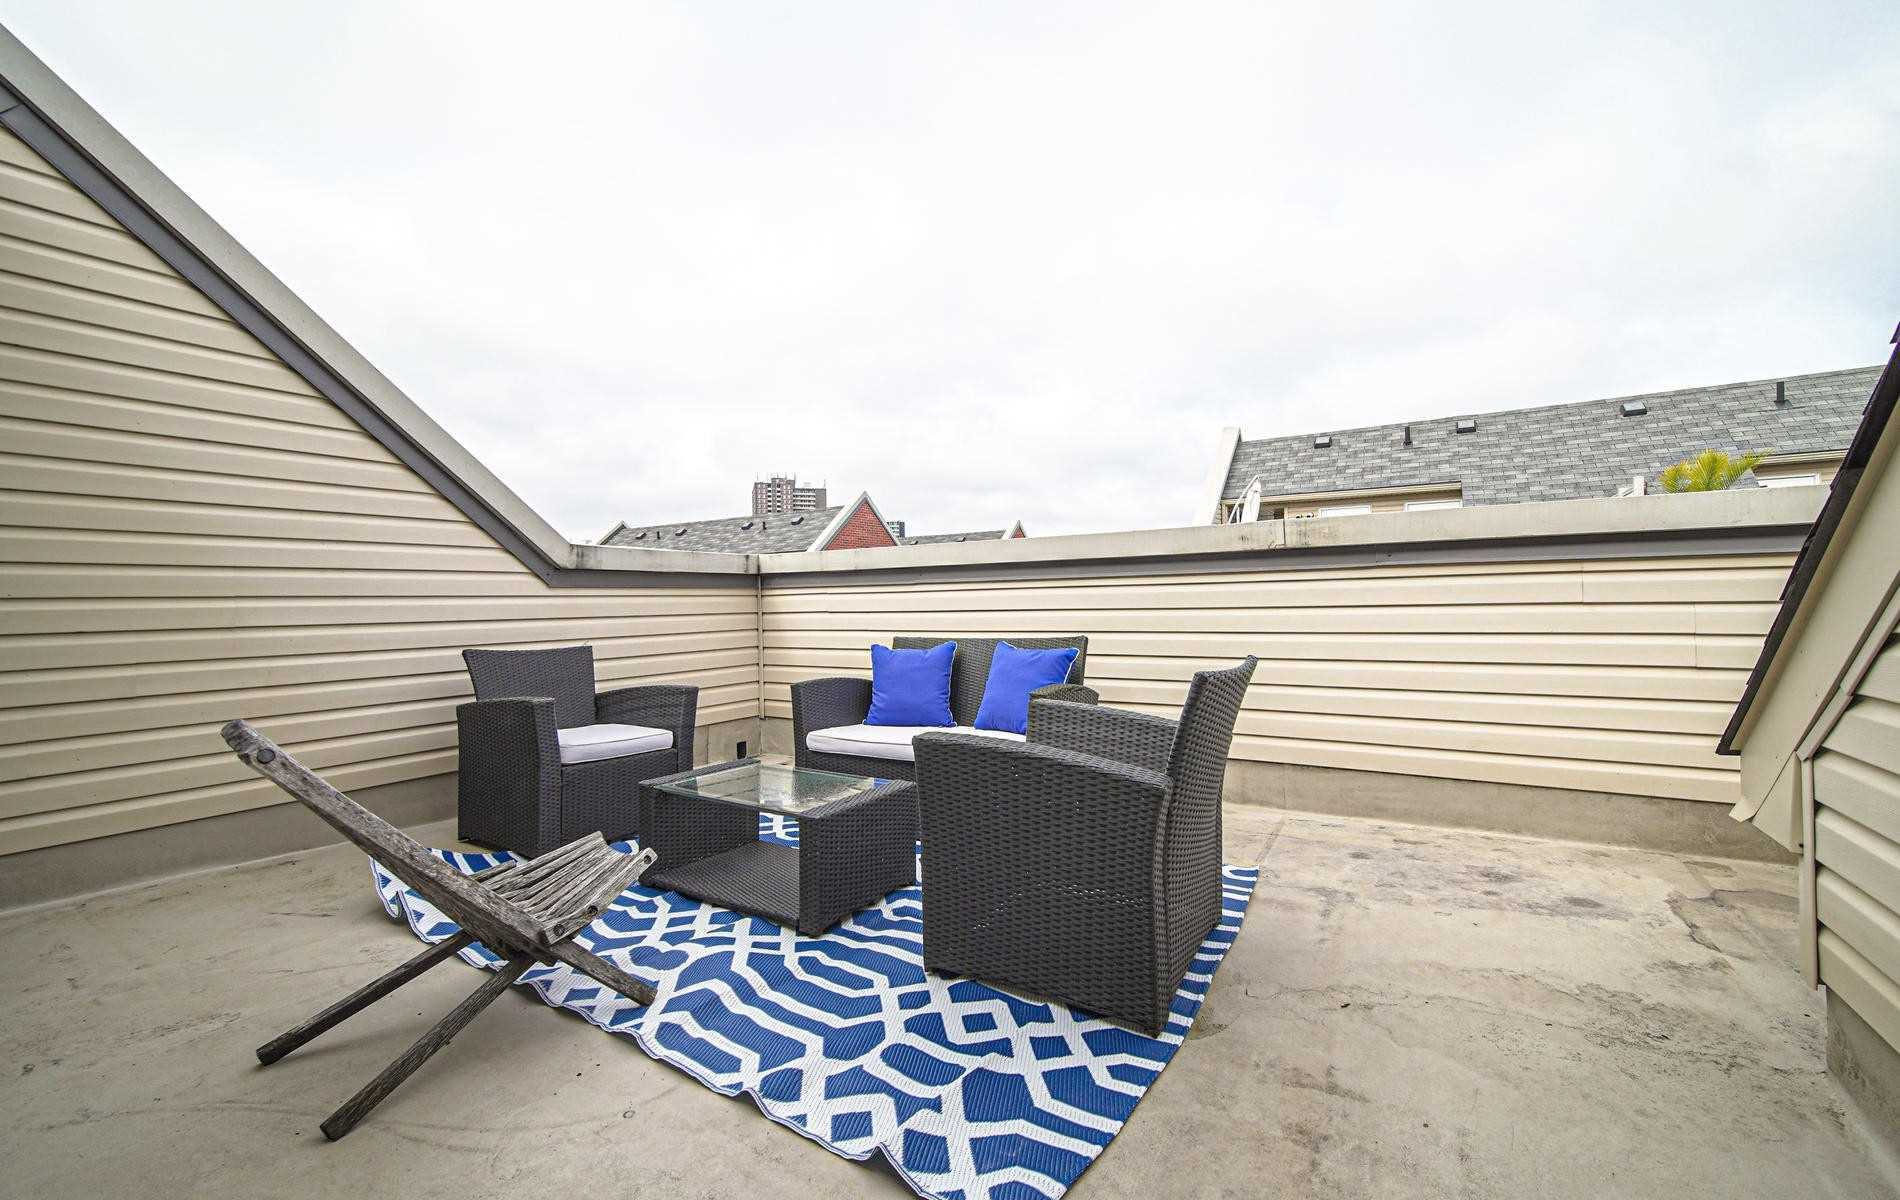 Photo 14: Photos: 3 78 Munro Street in Toronto: South Riverdale Condo for sale (Toronto E01)  : MLS®# E4615987